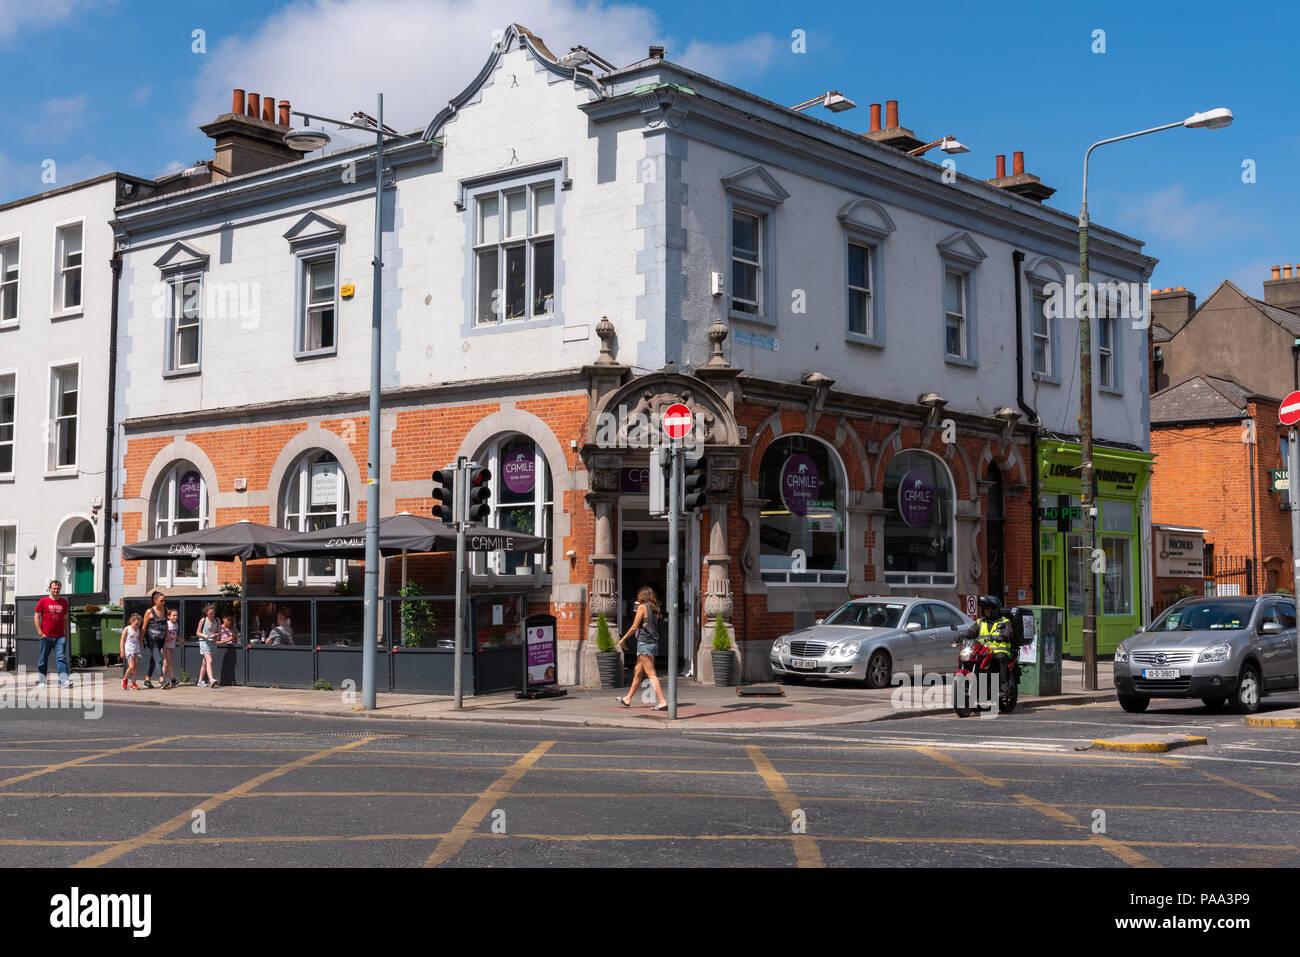 Neighborhood Restaurant in Dublin, Ireland - Stock Image